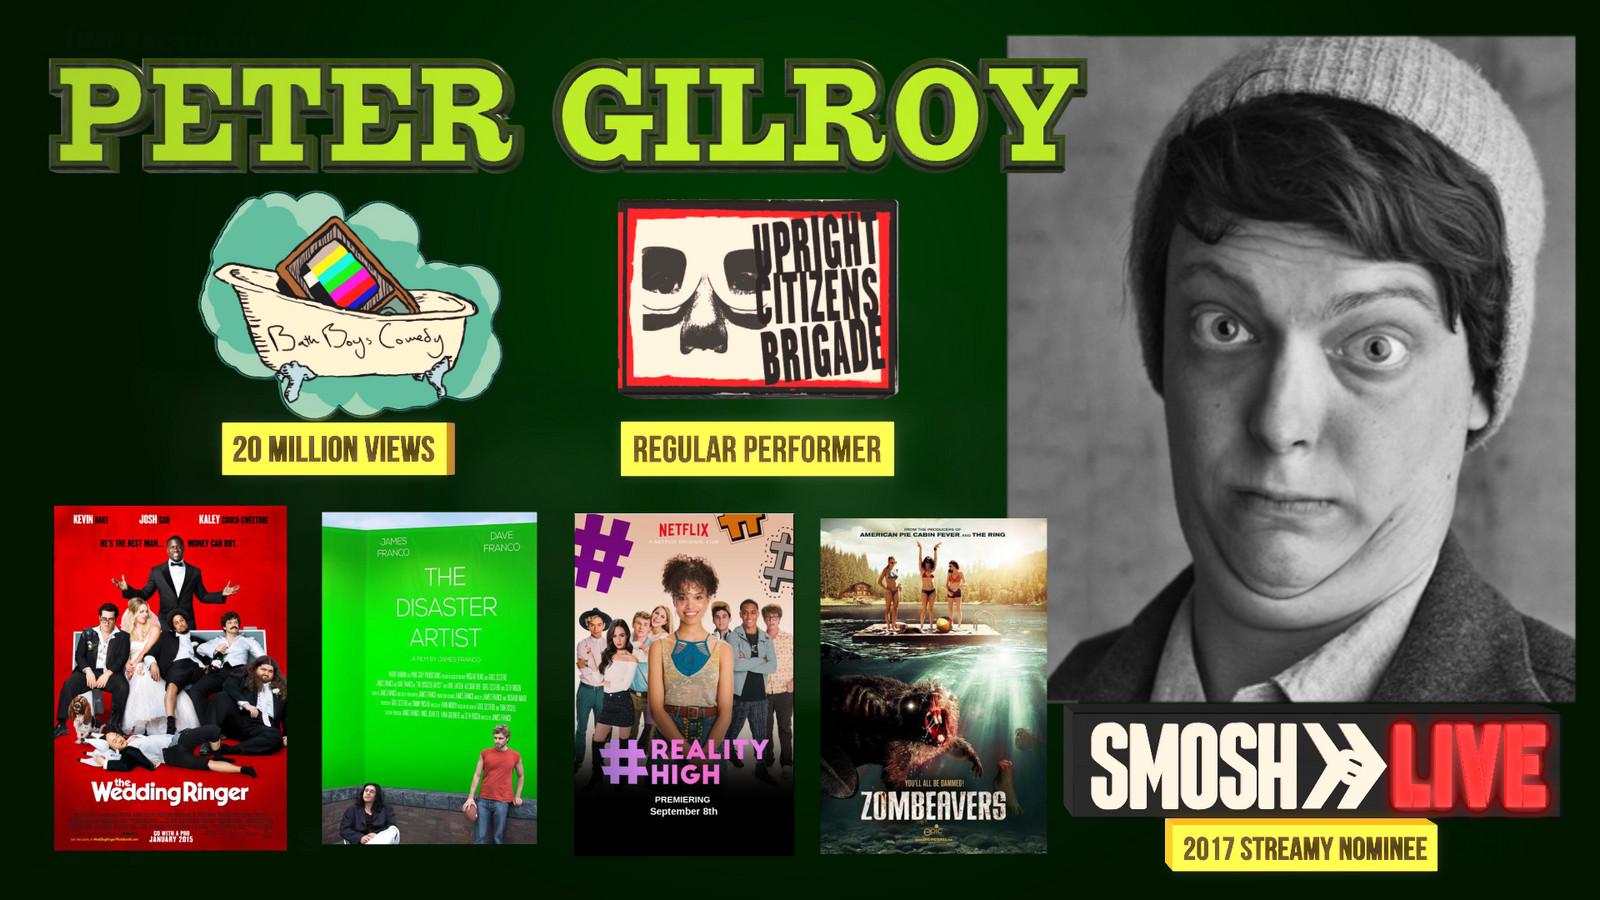 Peter Gilory